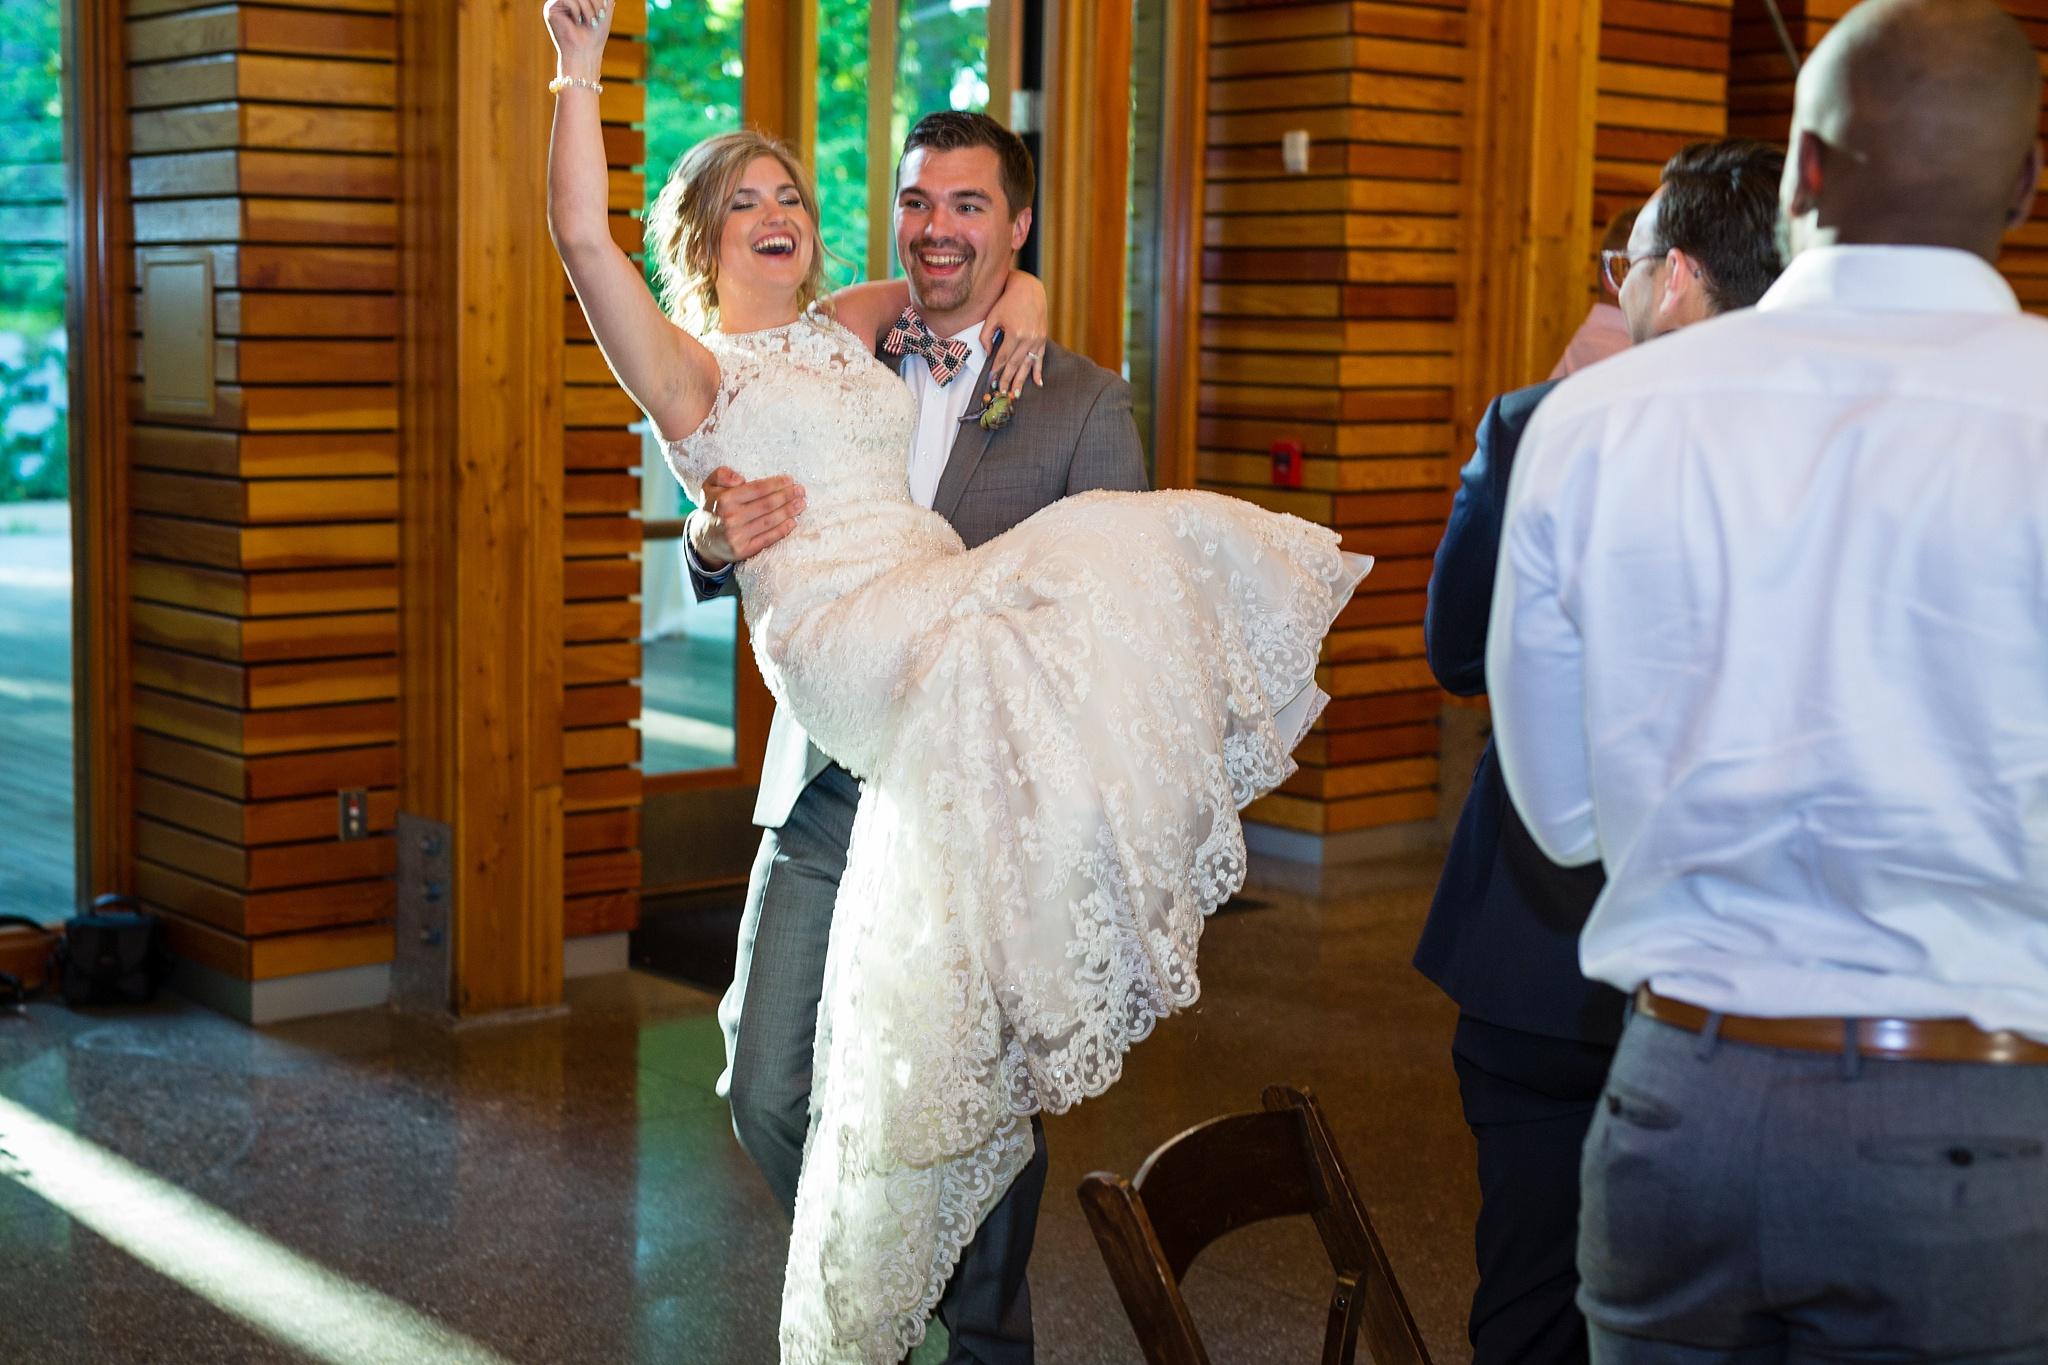 Mandi_Jack_Treehouse_Grand_Rapids_Wedding_0067.jpg